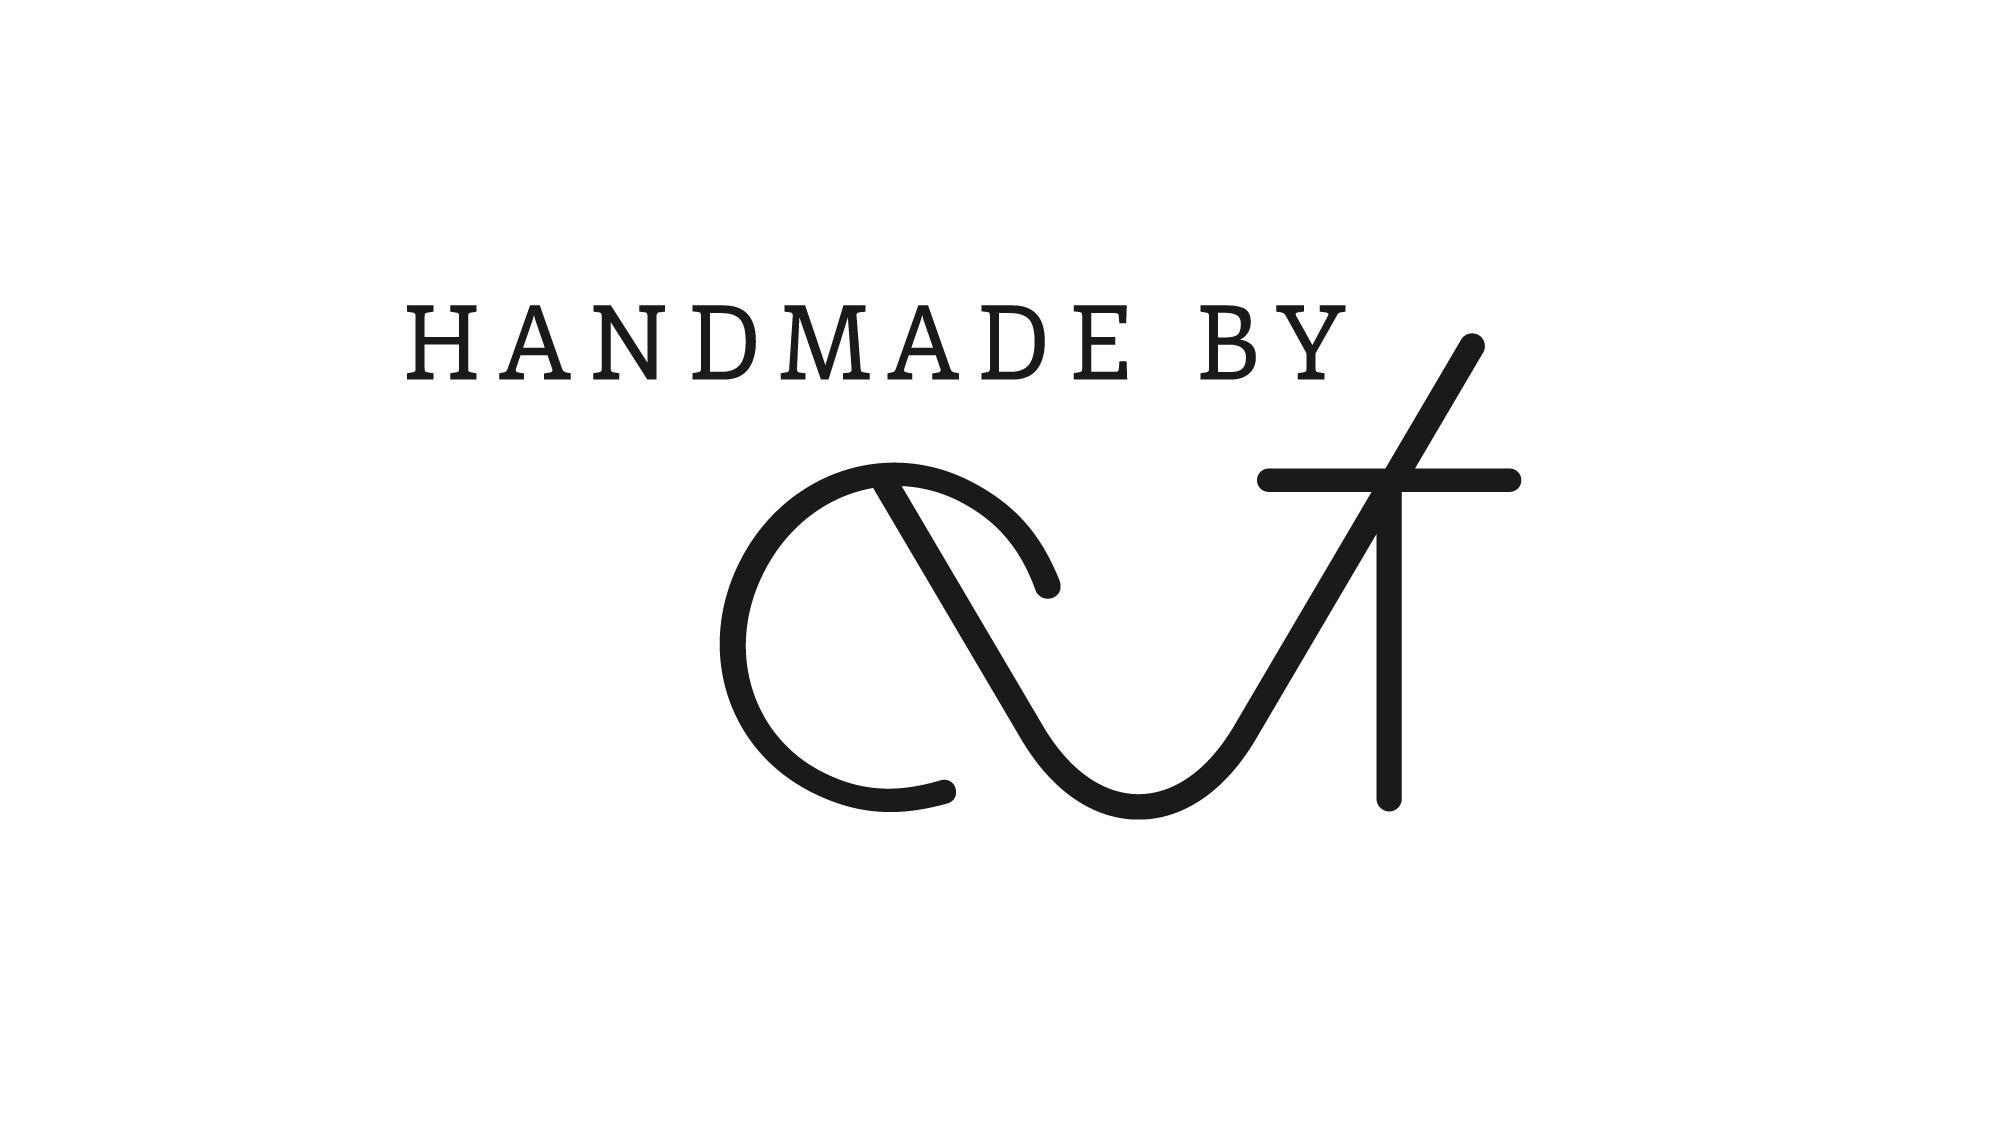 CD_CUT_Logo.jpg